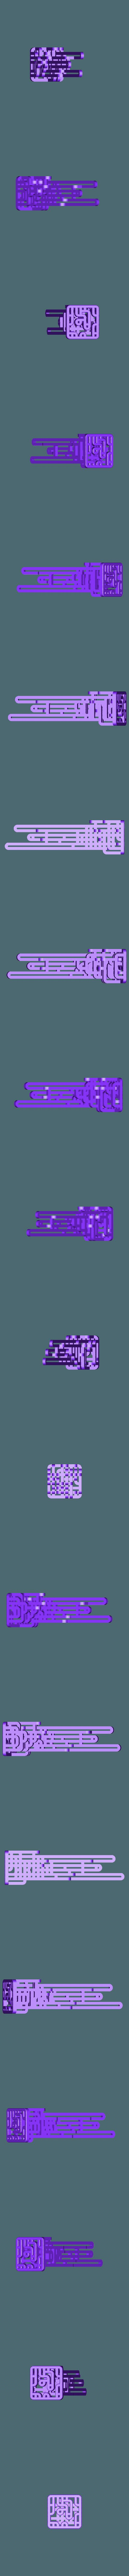 big1.stl Download free STL file Procedural Loops  • 3D print template, ferjerez3d